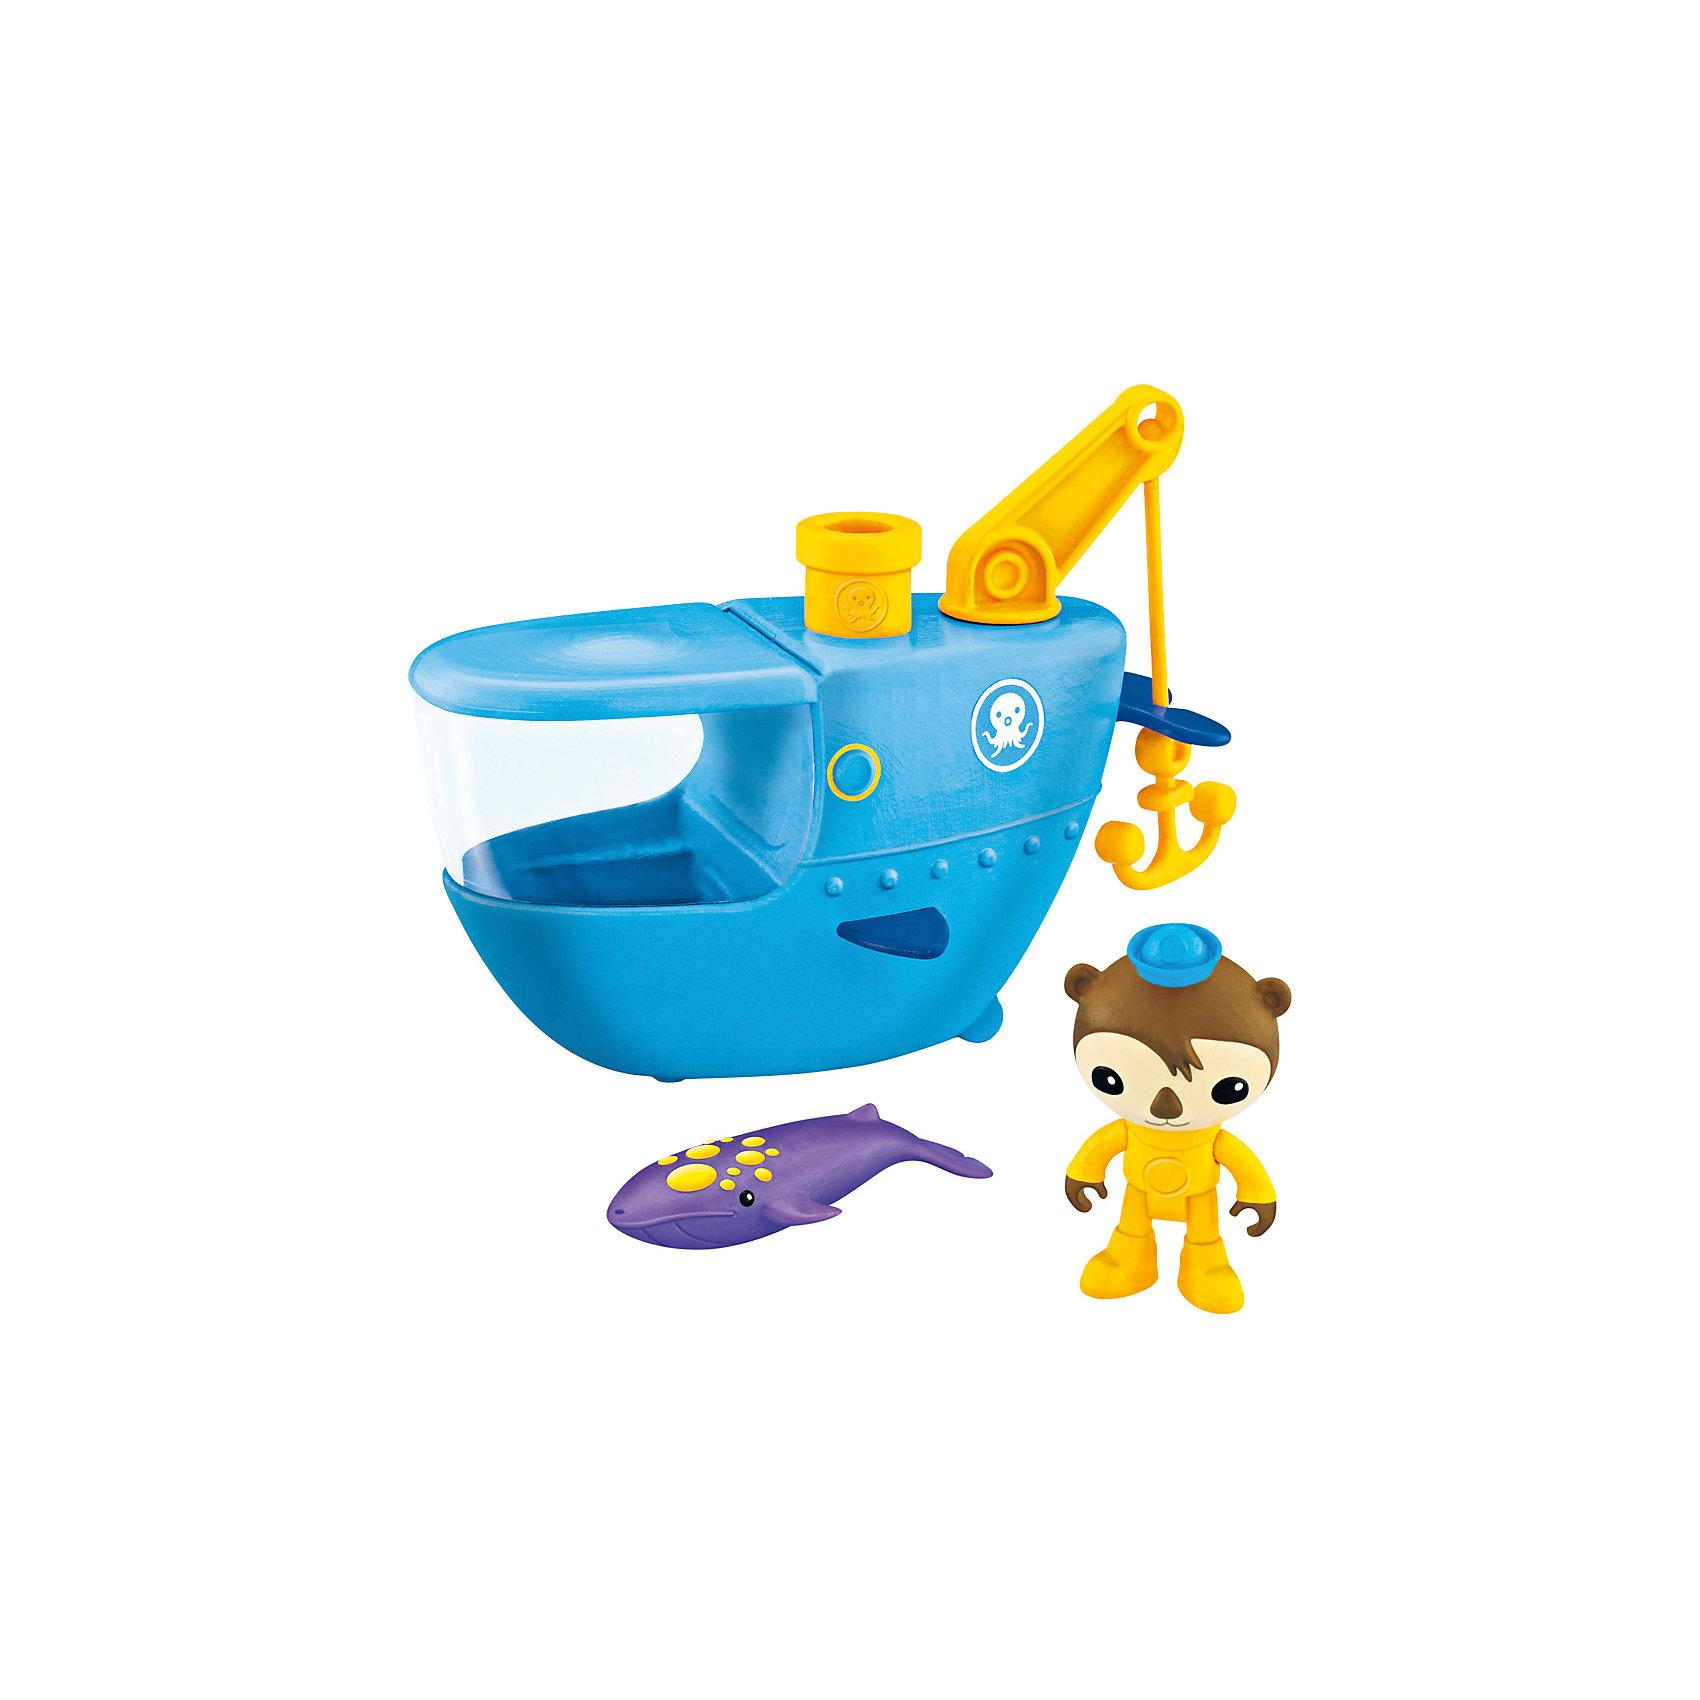 Mattel Подводный транспорт, Октонавты, Fisher Price mattel базовая фигурка октонавты fisher price